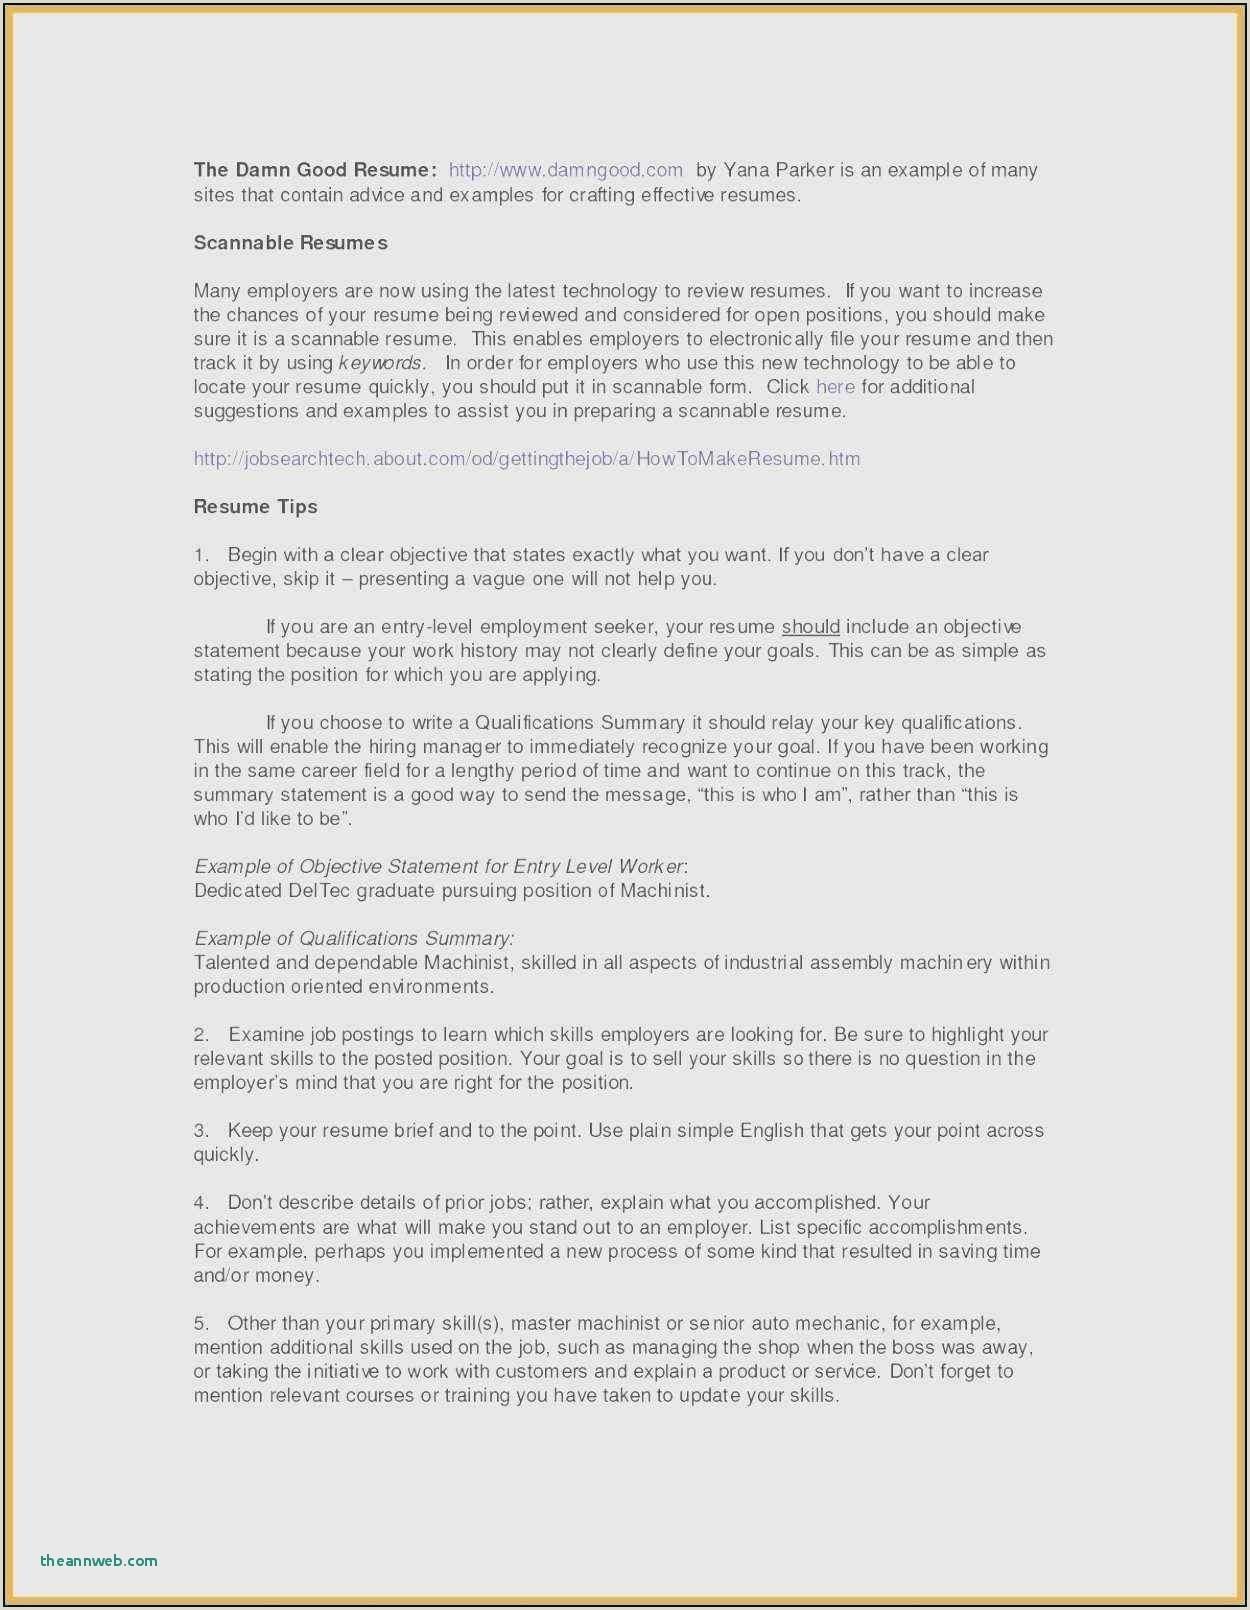 Cv Samples For Job Of Accountant Resume For Accountant Job Best Covering Letter For Cv